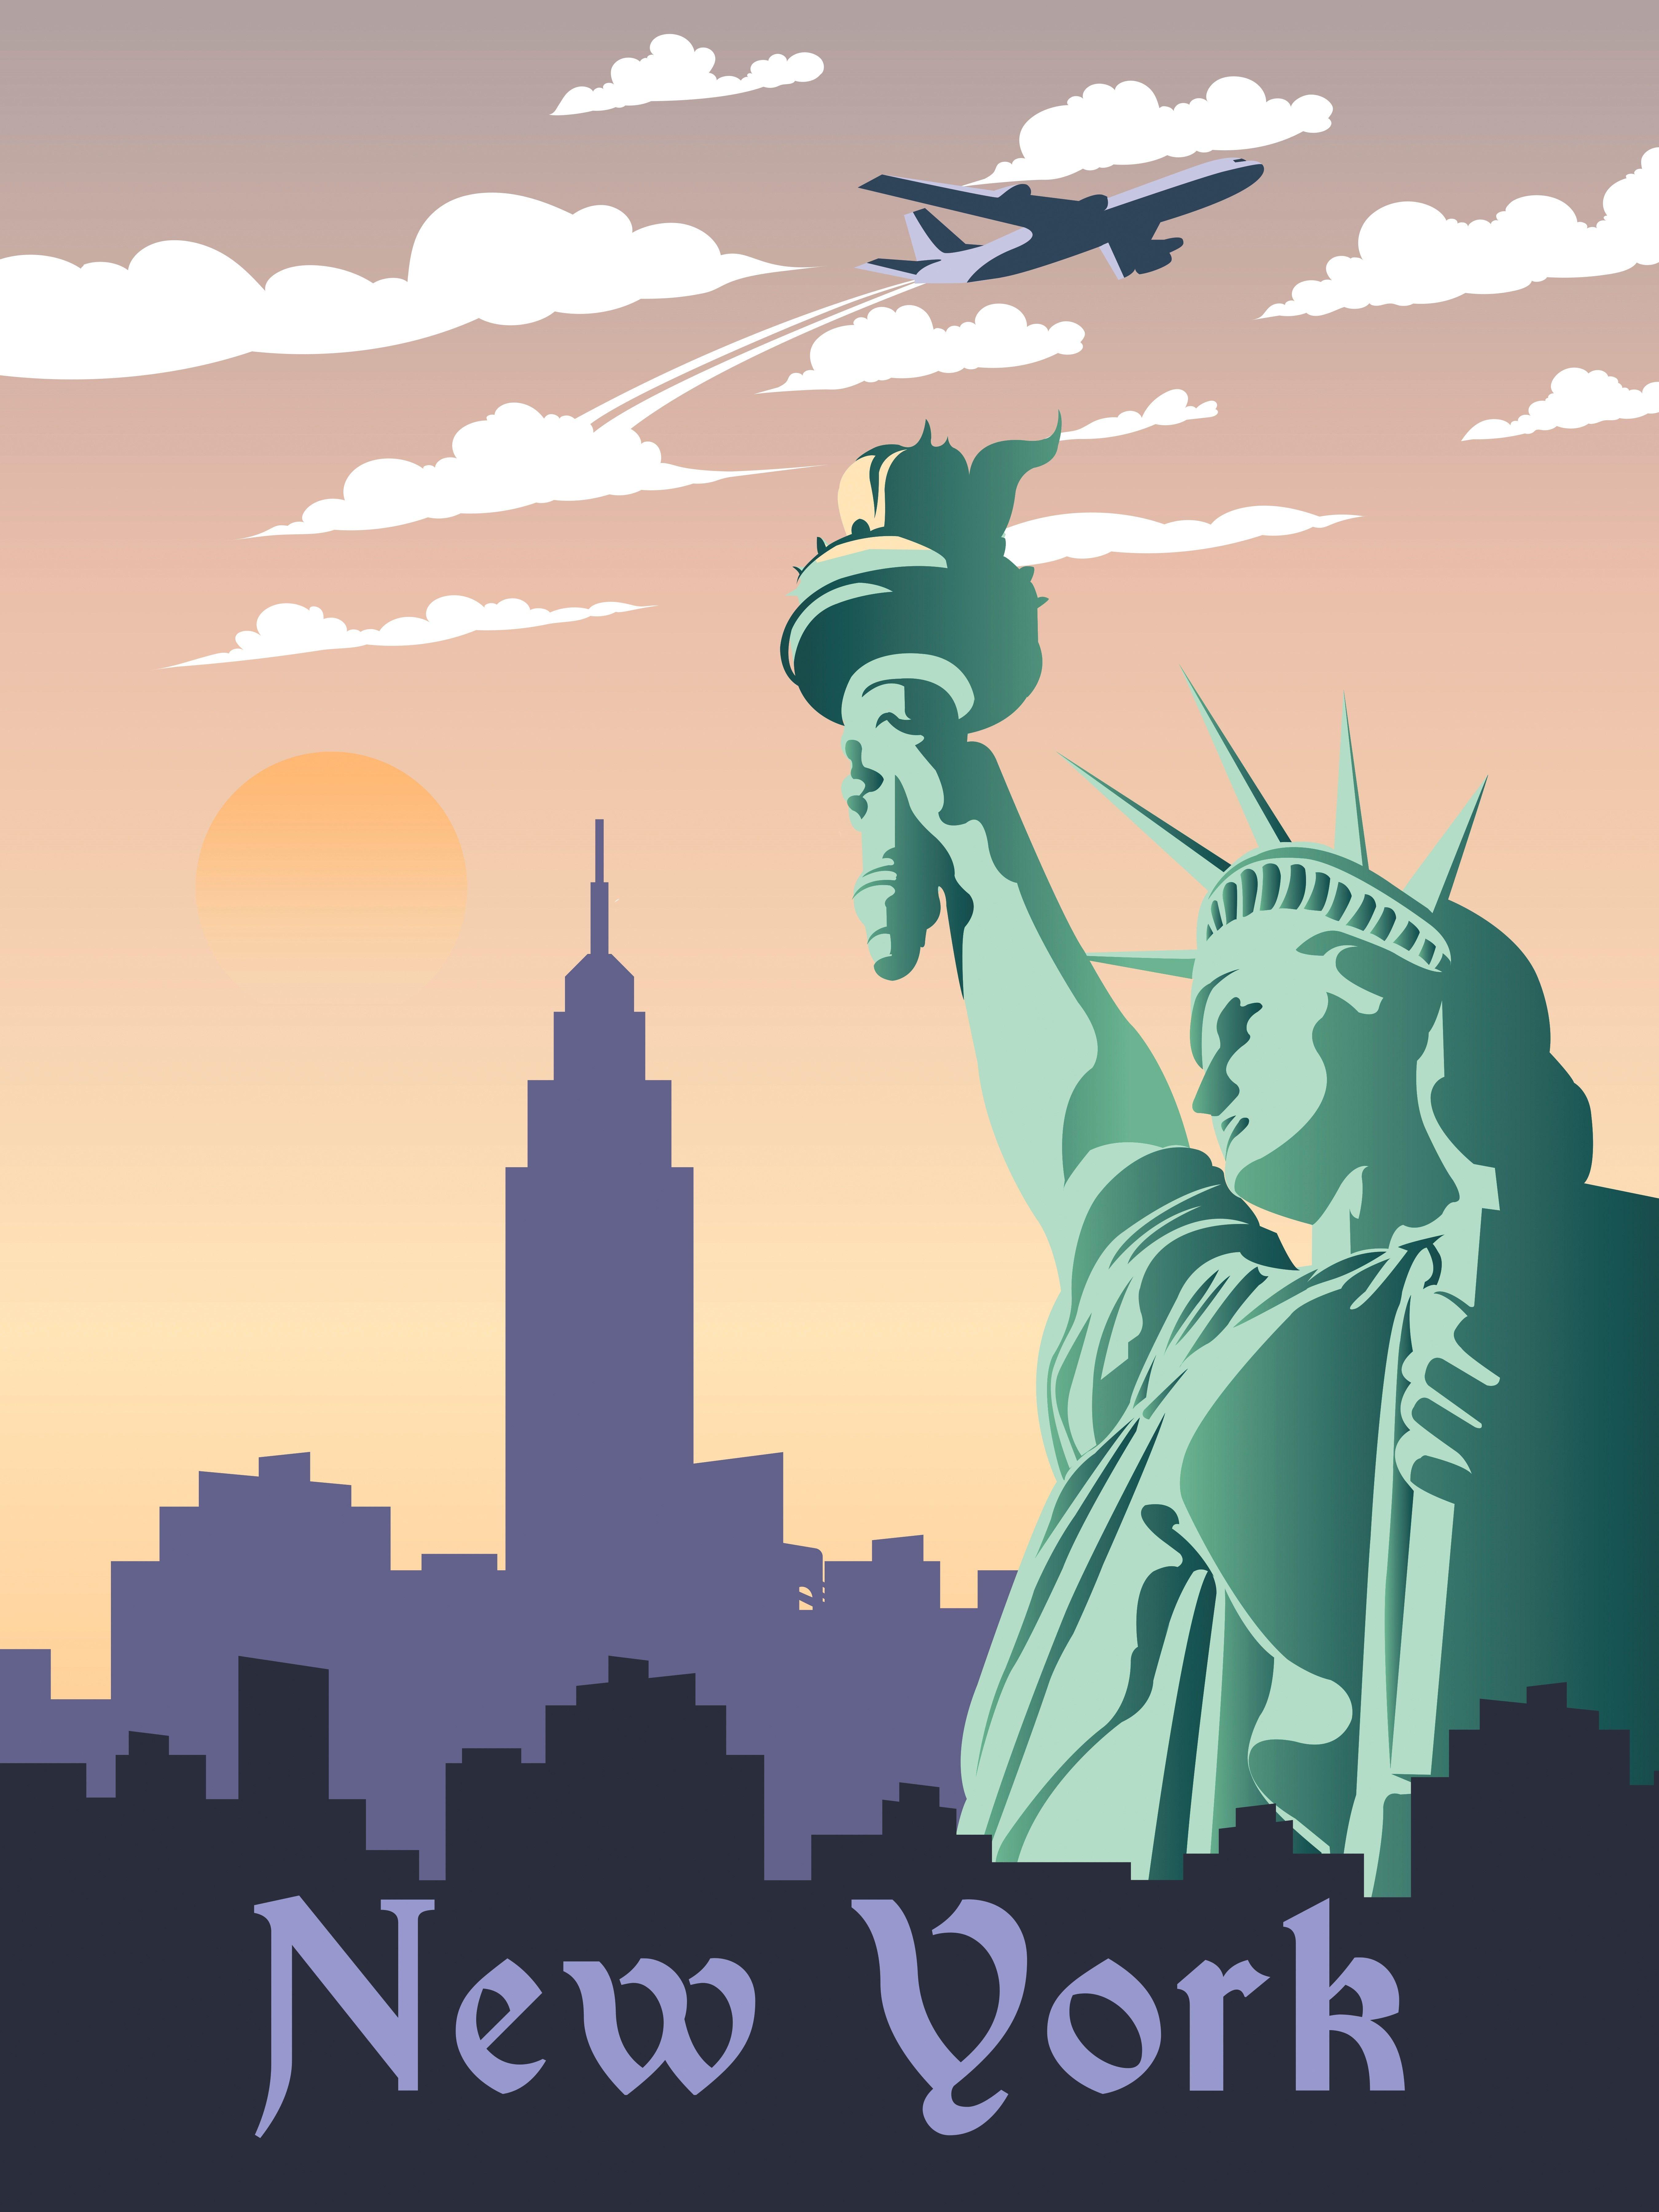 New York Travel Poster Vintage Retro Wall Art Printable City Artwork Statue Of Liberty Nyc Digital Landmark S City Artwork Vintage Posters Poster Vintage Retro